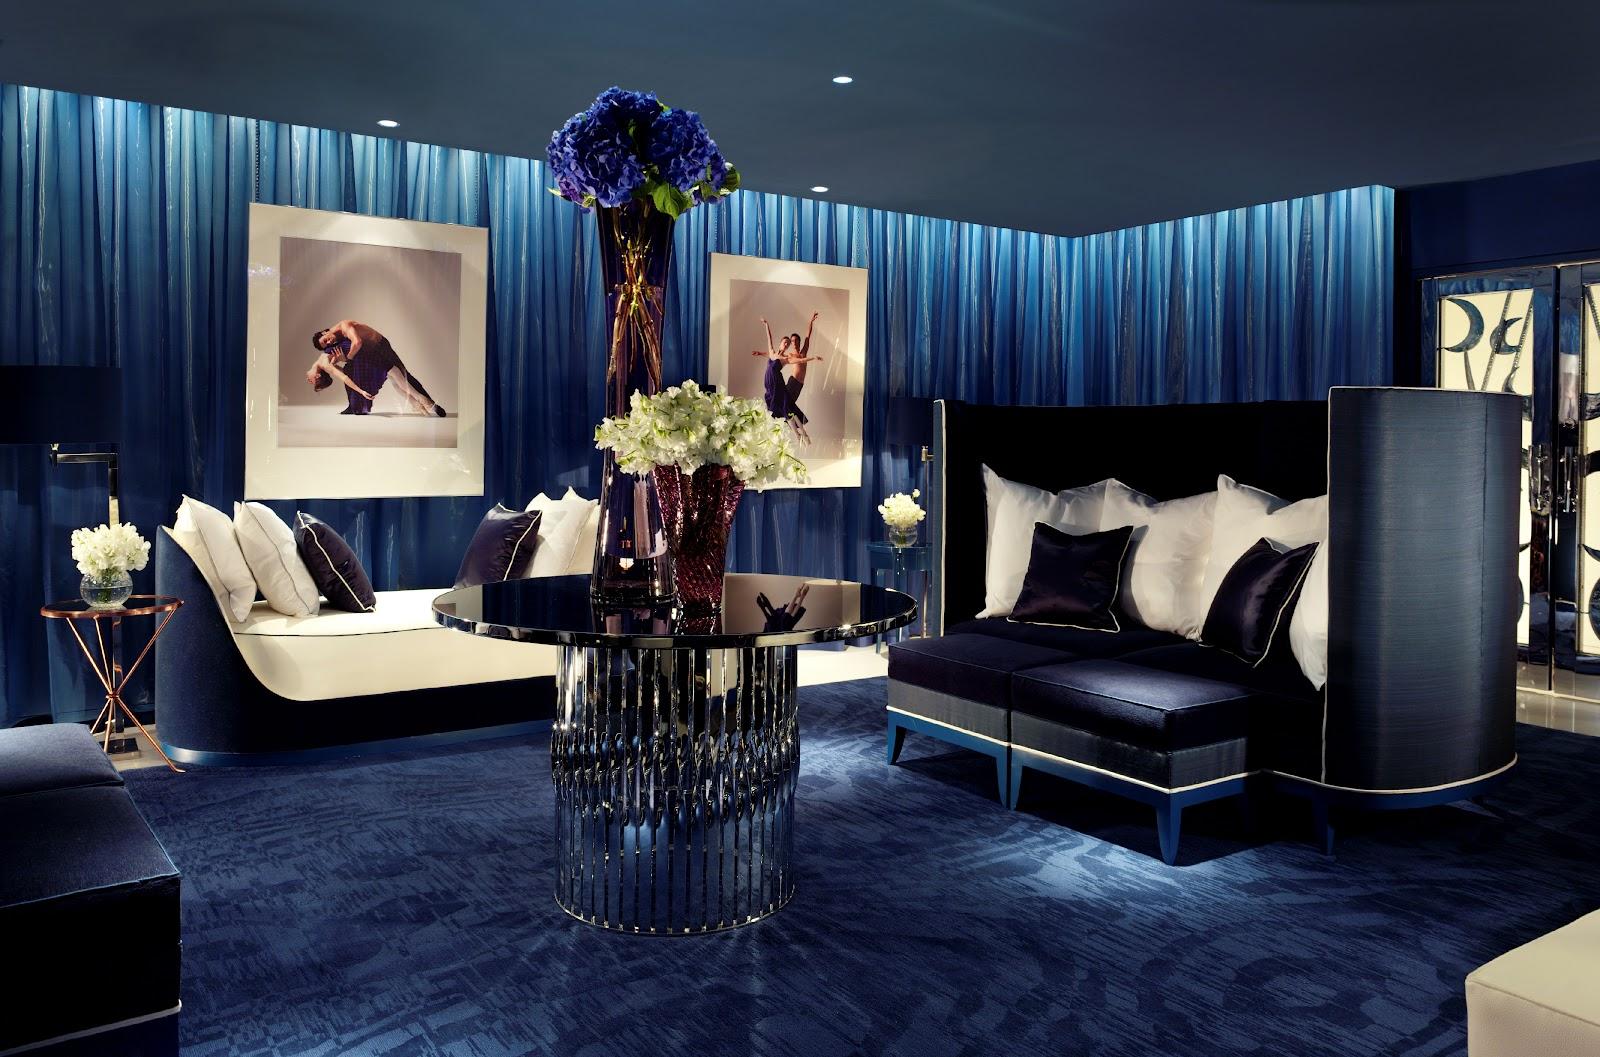 Relaxation Room The Dorchester Hotel Spa - Carol Joy London